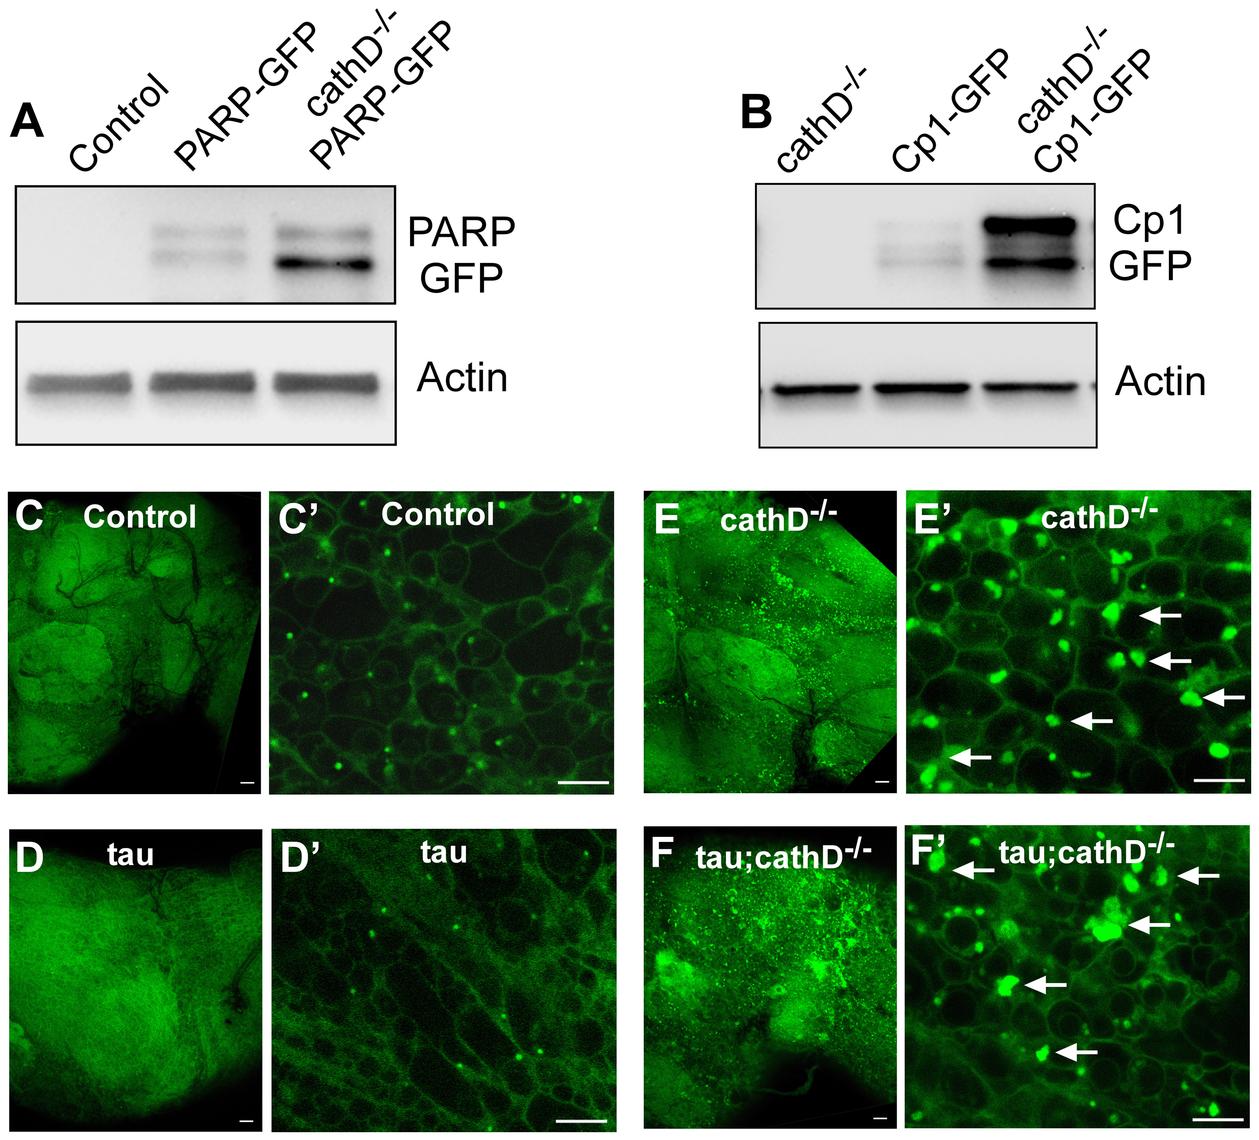 Widespread lysosomal abnormalities in cathepsin D deficient brains.